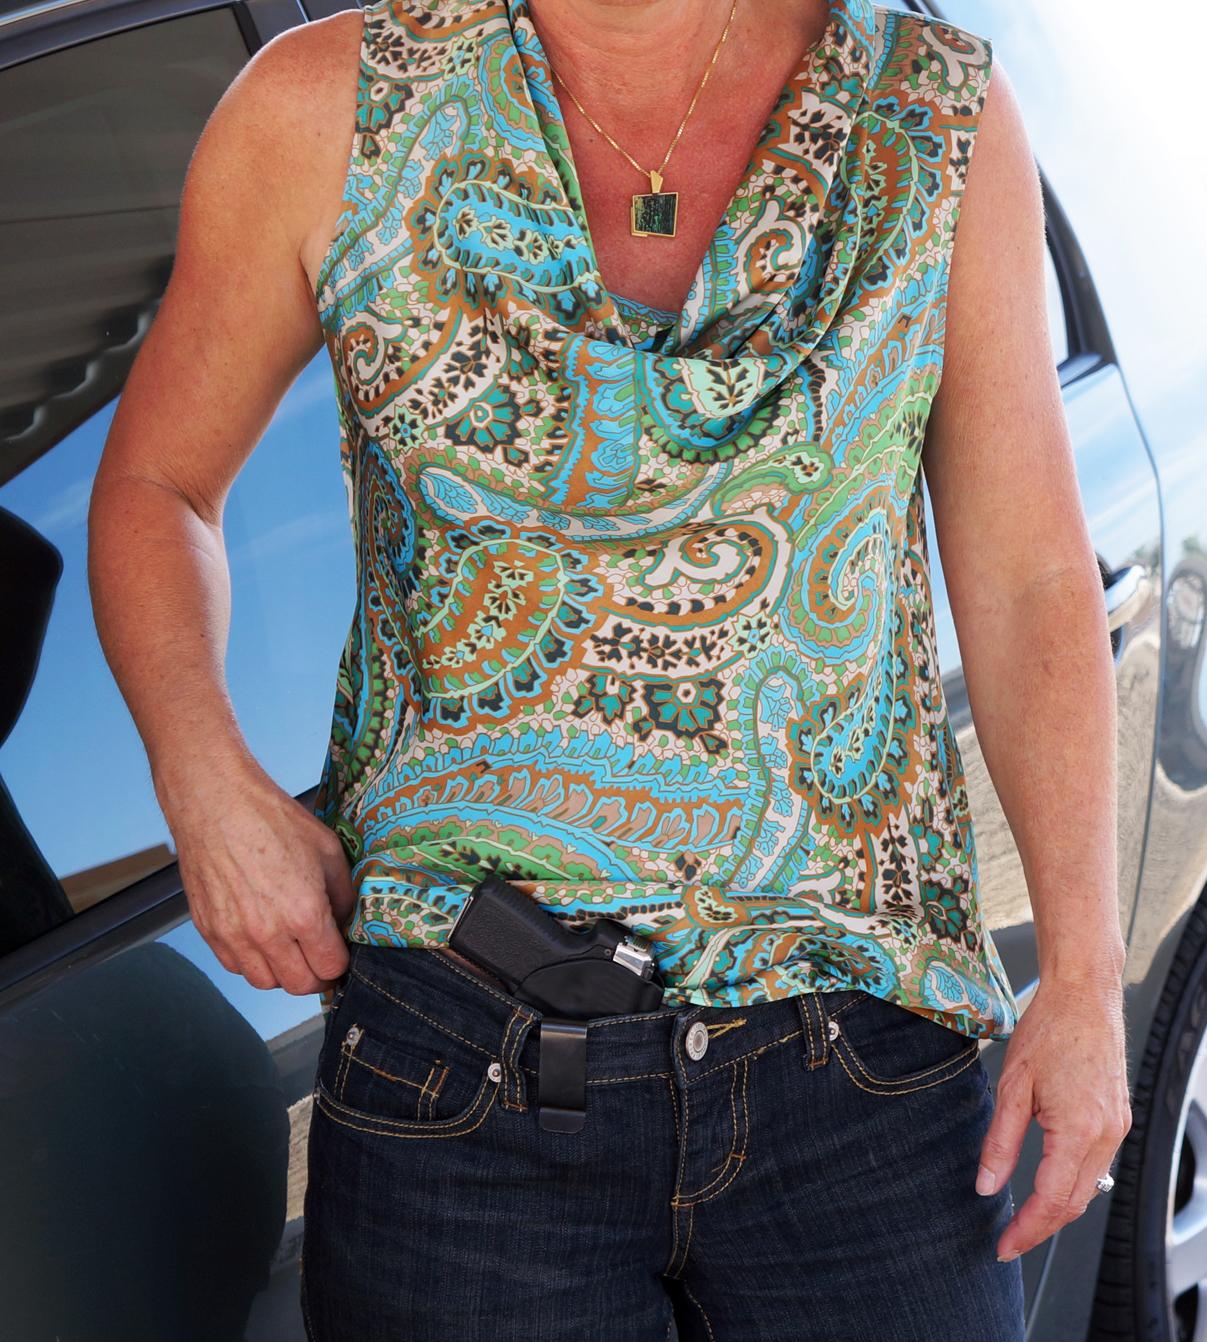 Betty Holster shown